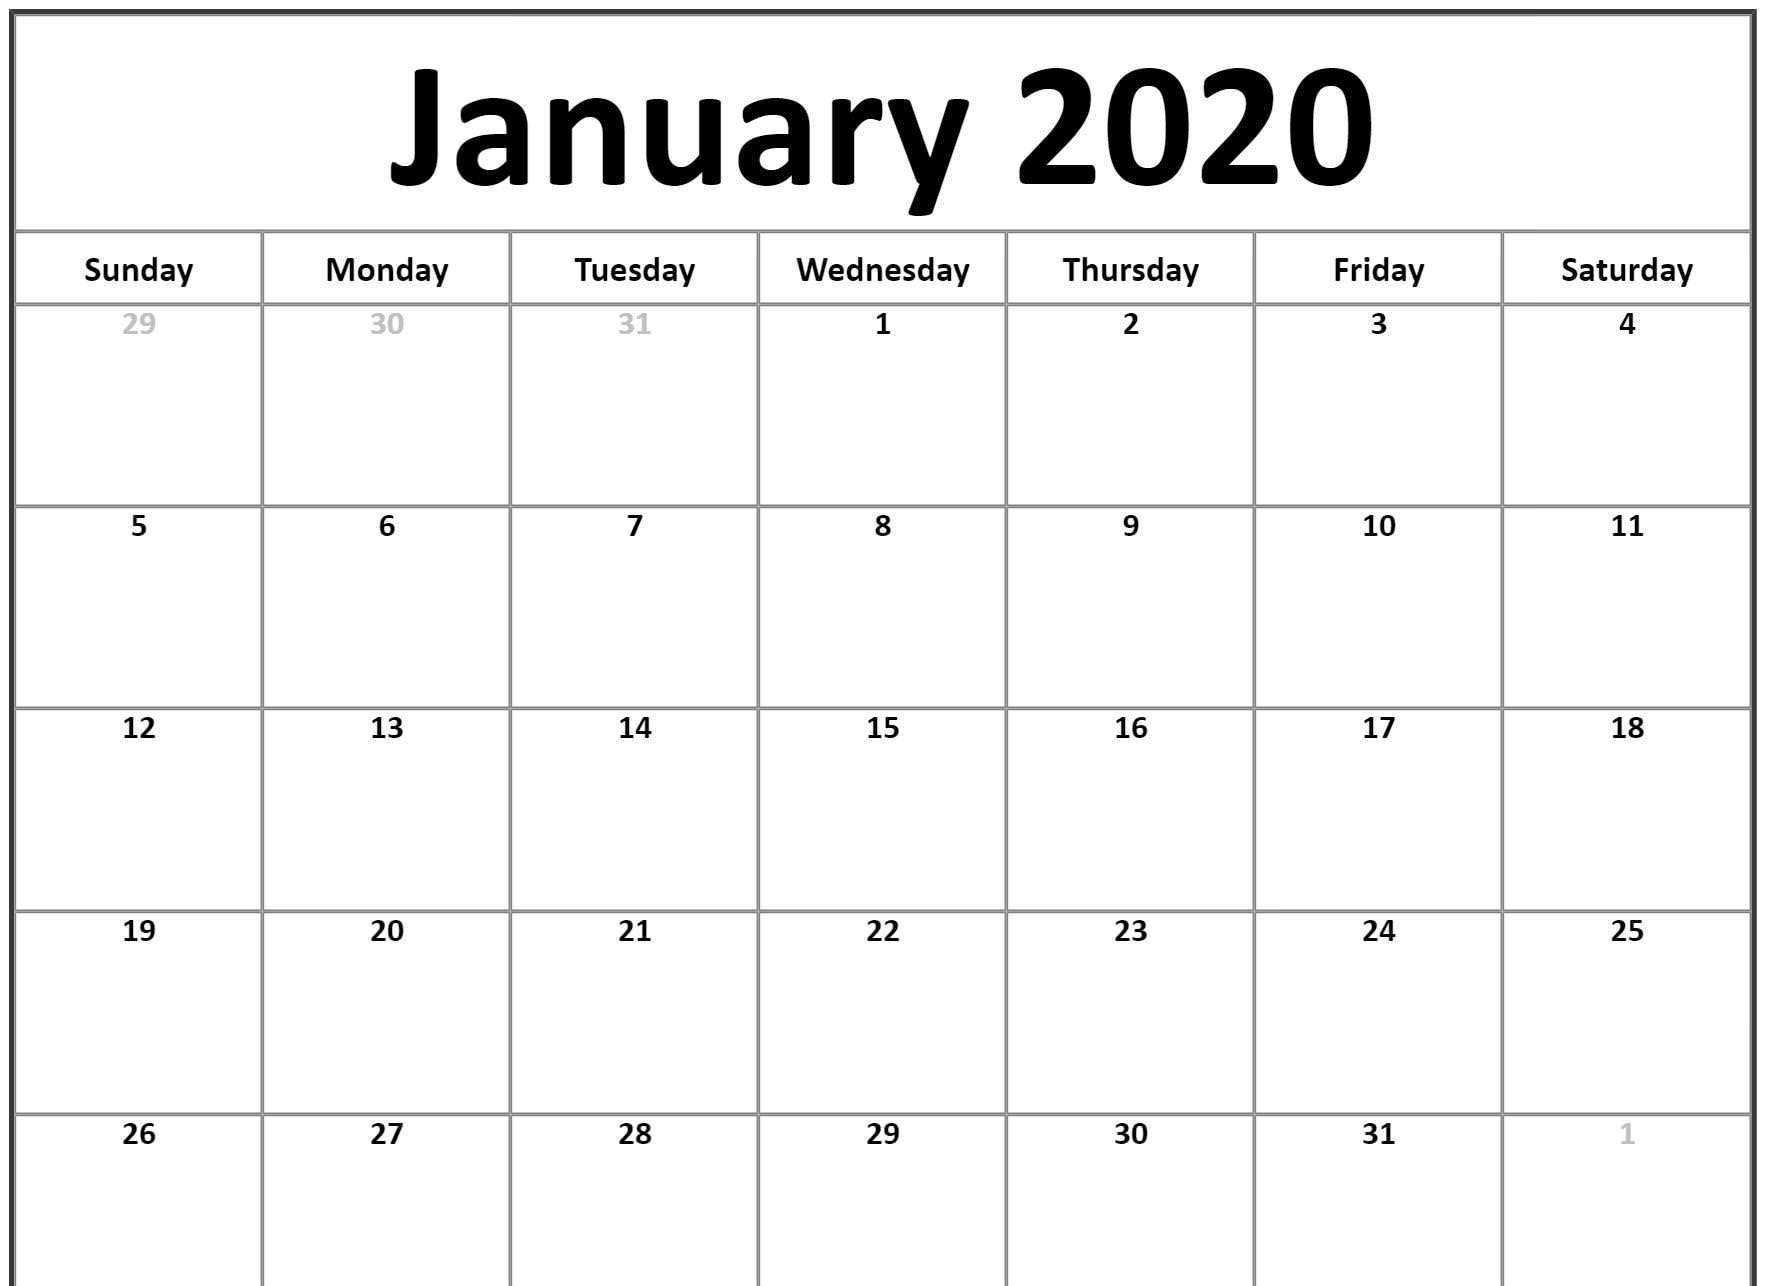 January Calendar 2020 Landscape - Free August 2019 Calendar